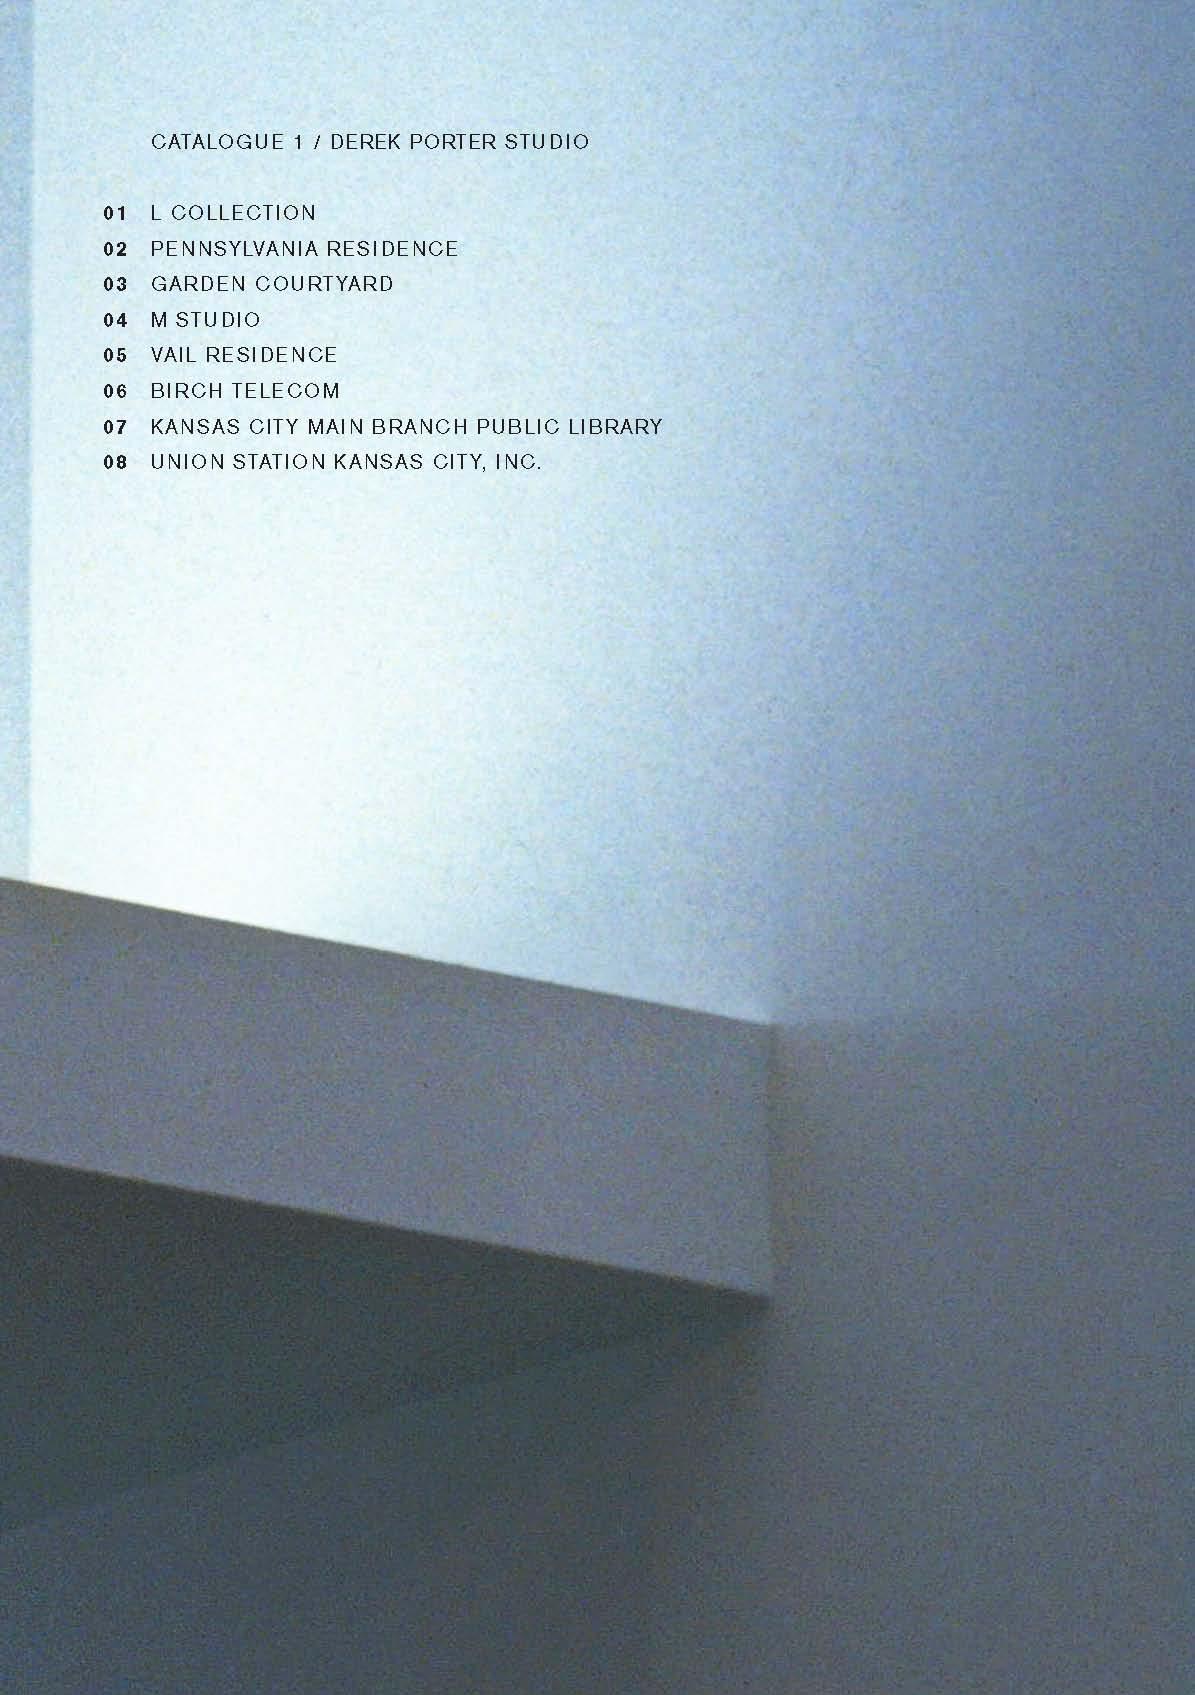 DPS Catalogue 1_cover.jpg